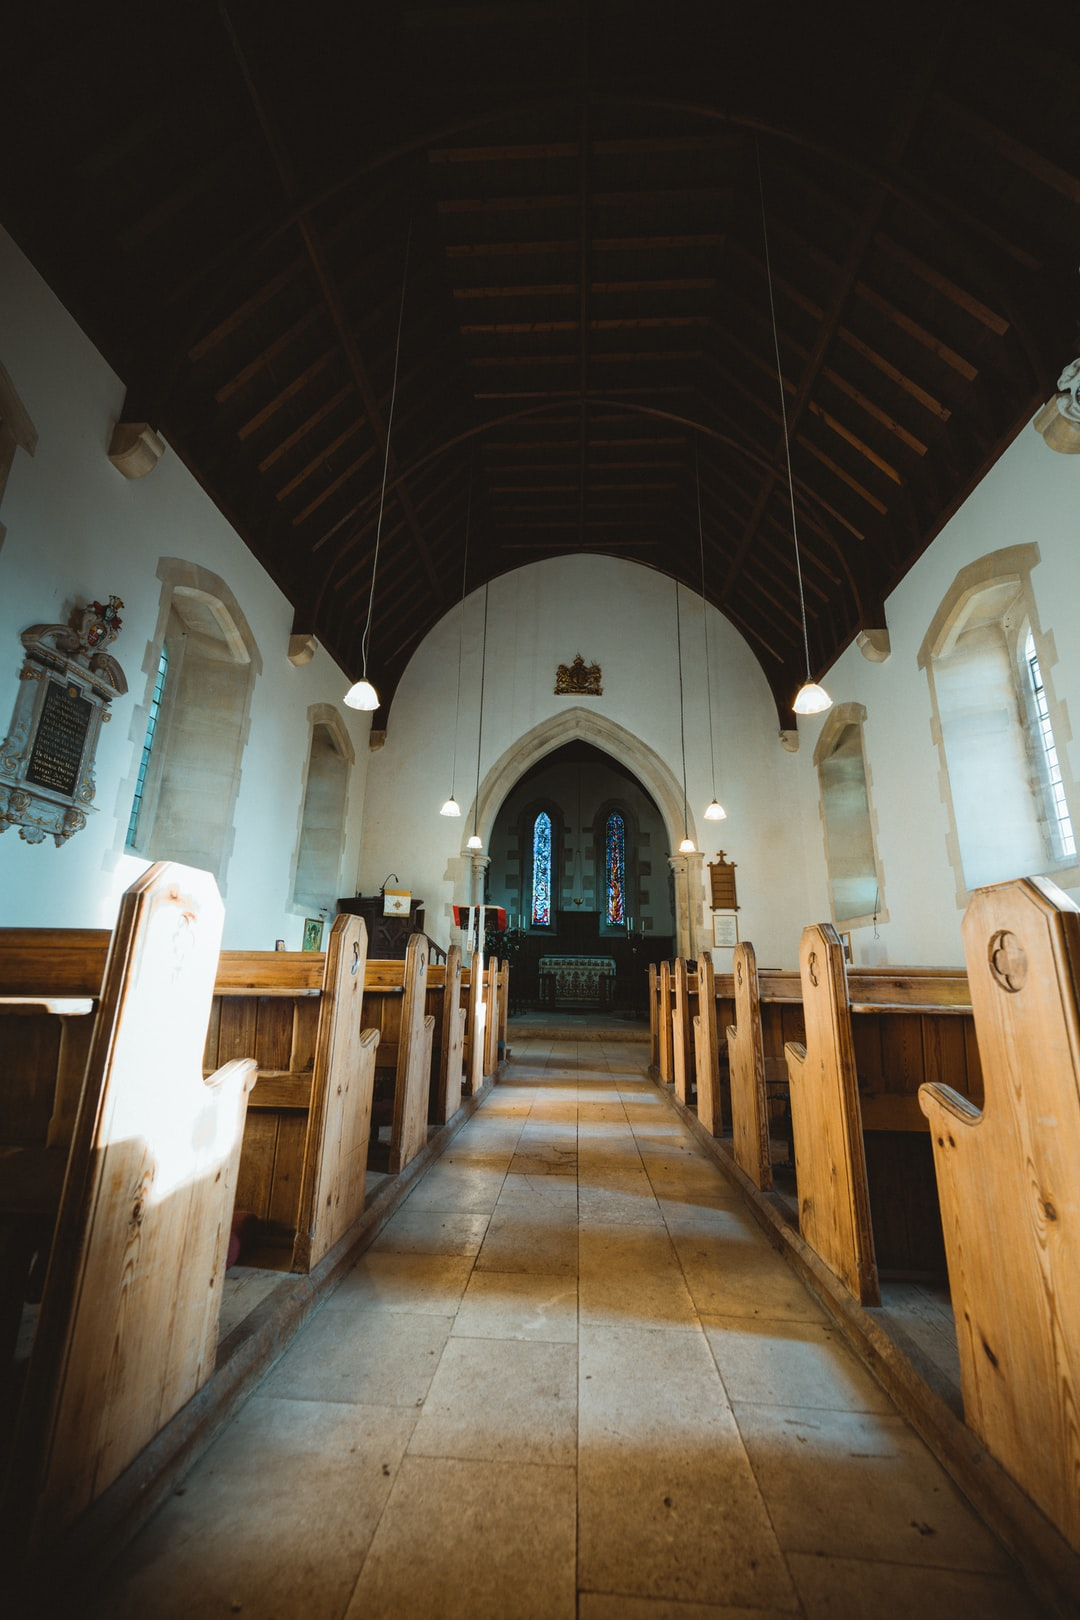 Small local church